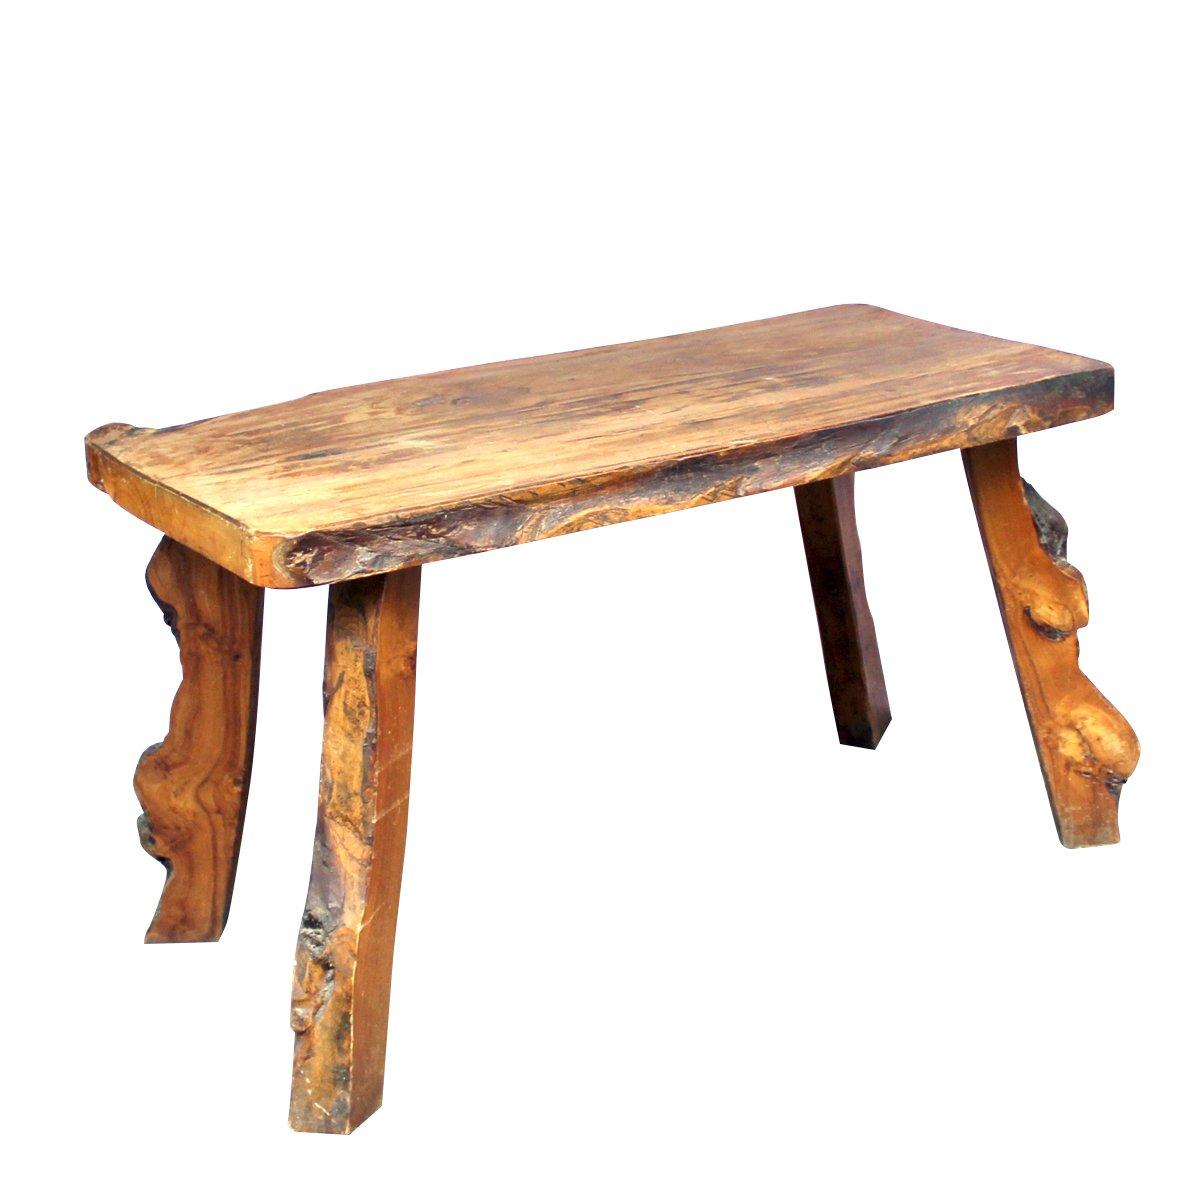 solider ulmenholz vintage tisch bei pamono kaufen. Black Bedroom Furniture Sets. Home Design Ideas